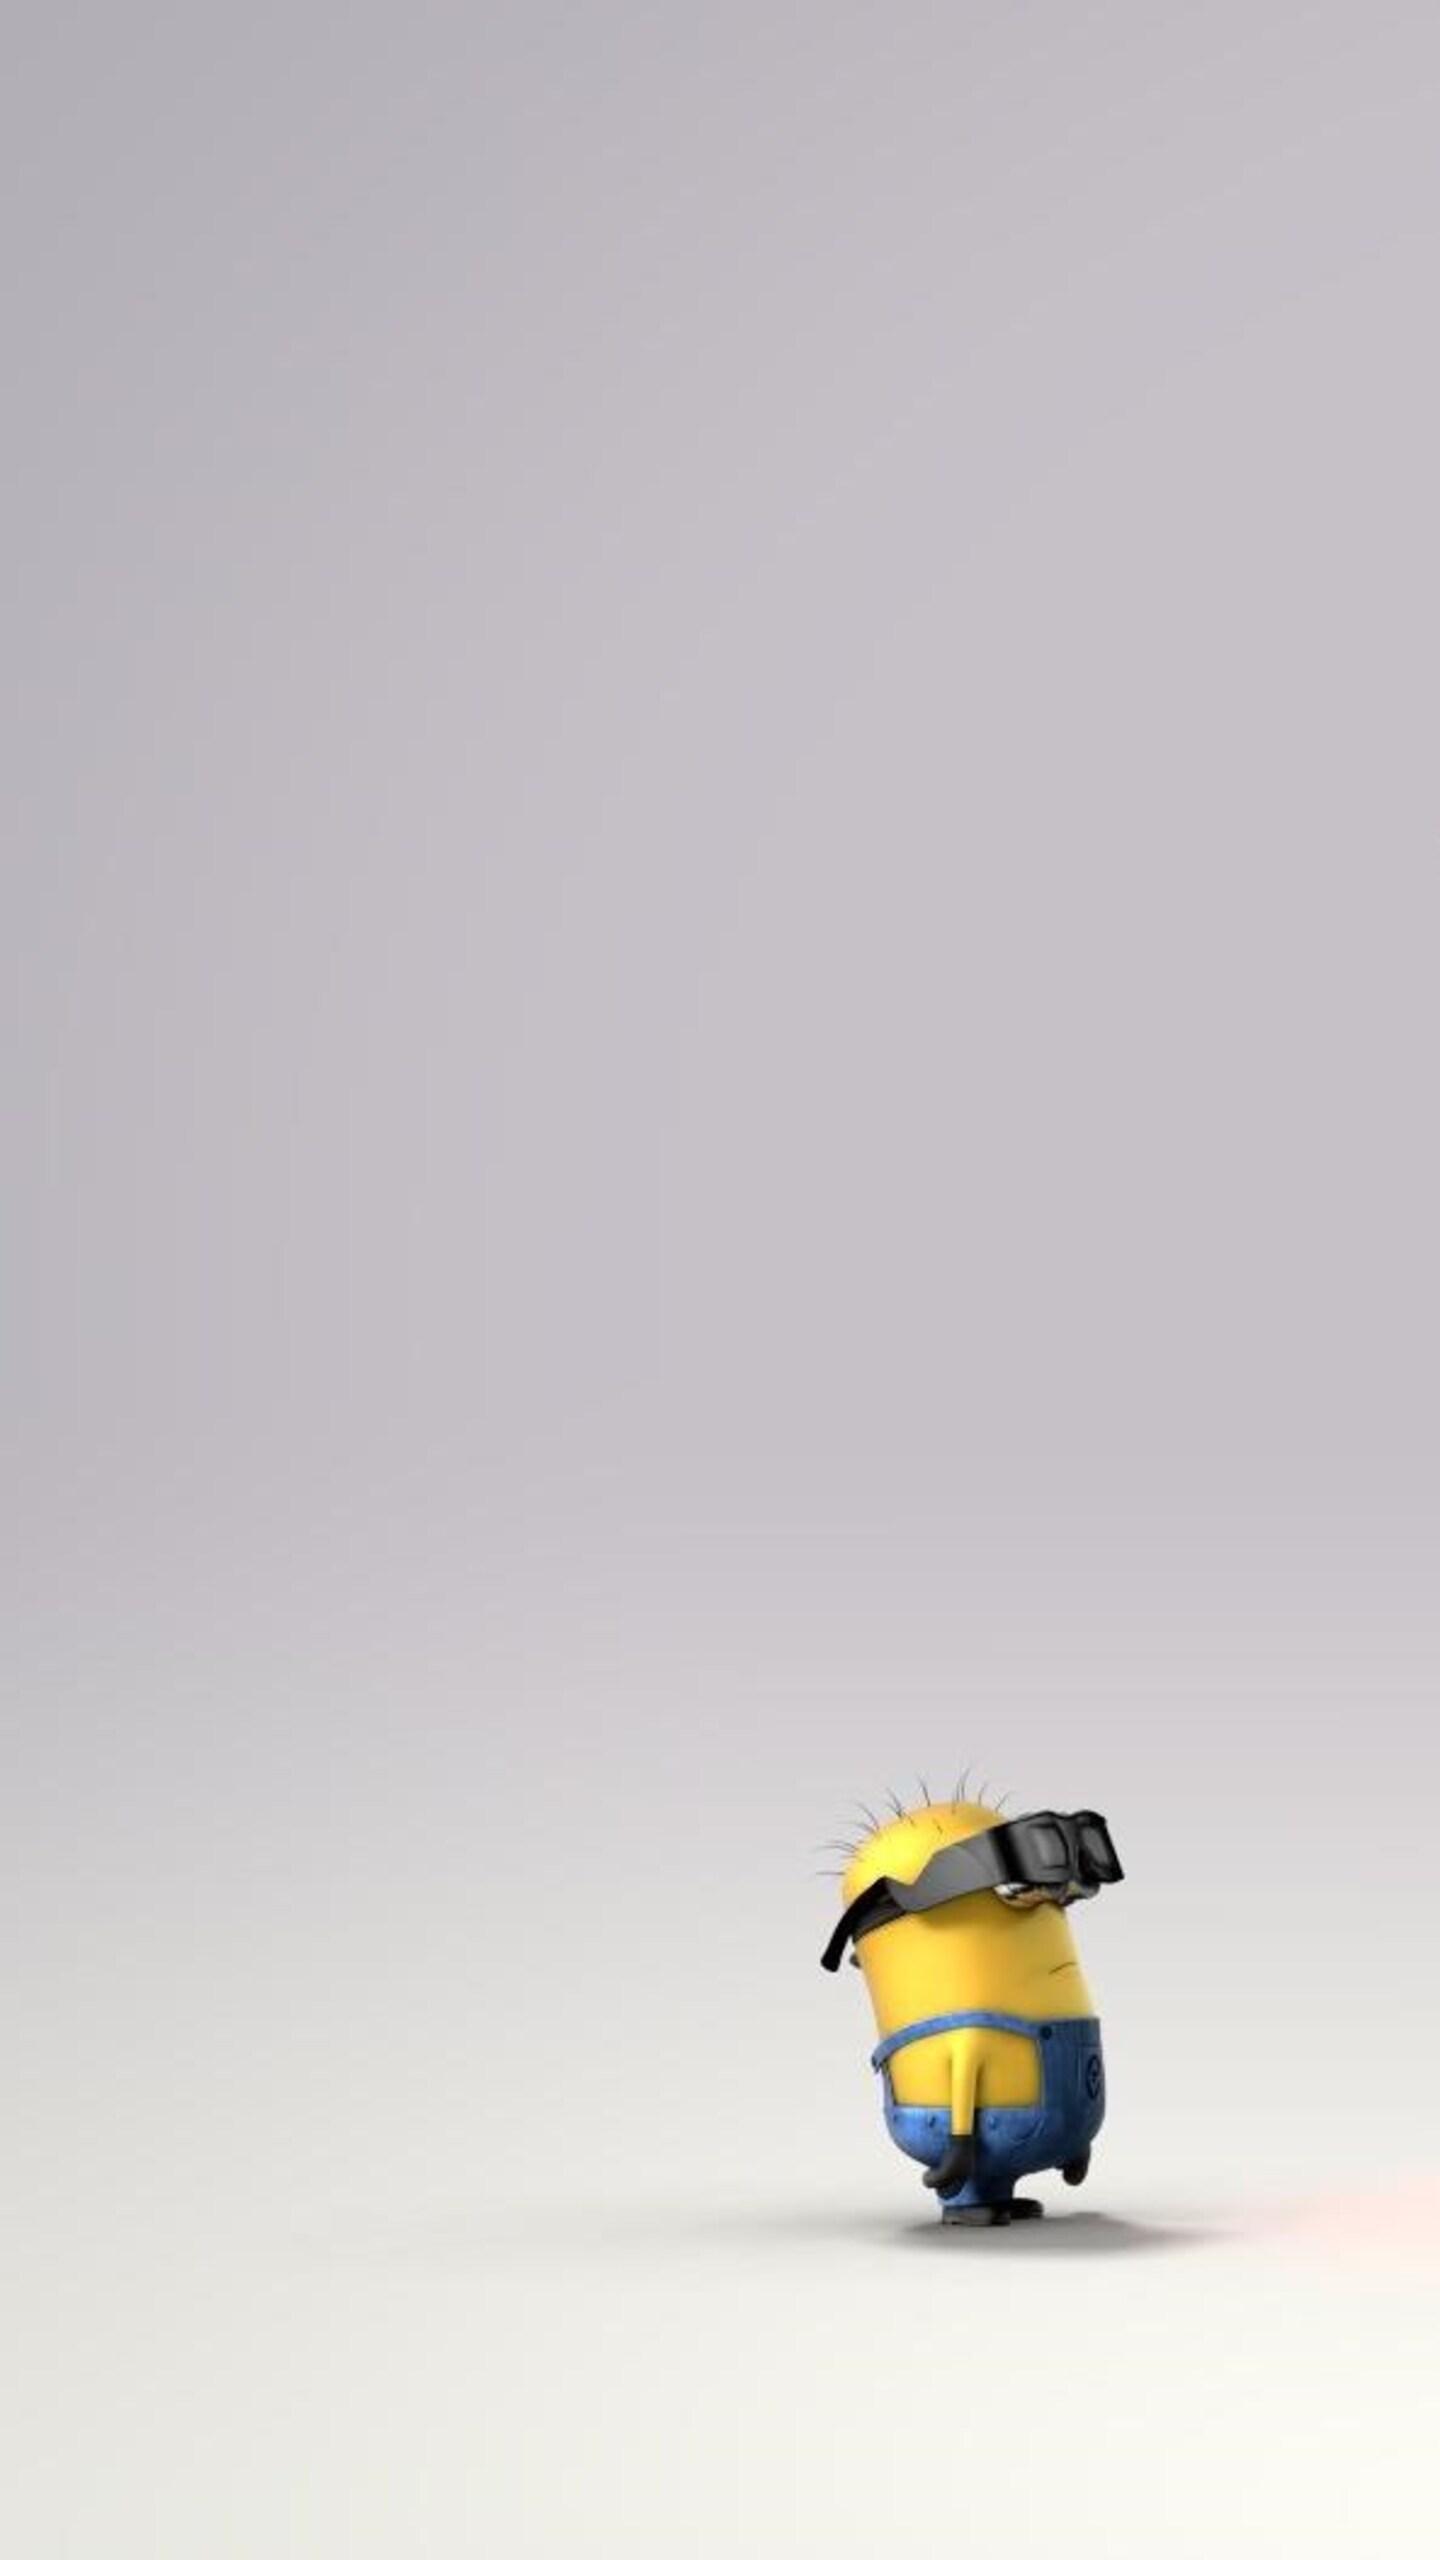 minions-funny-4-4k.jpg